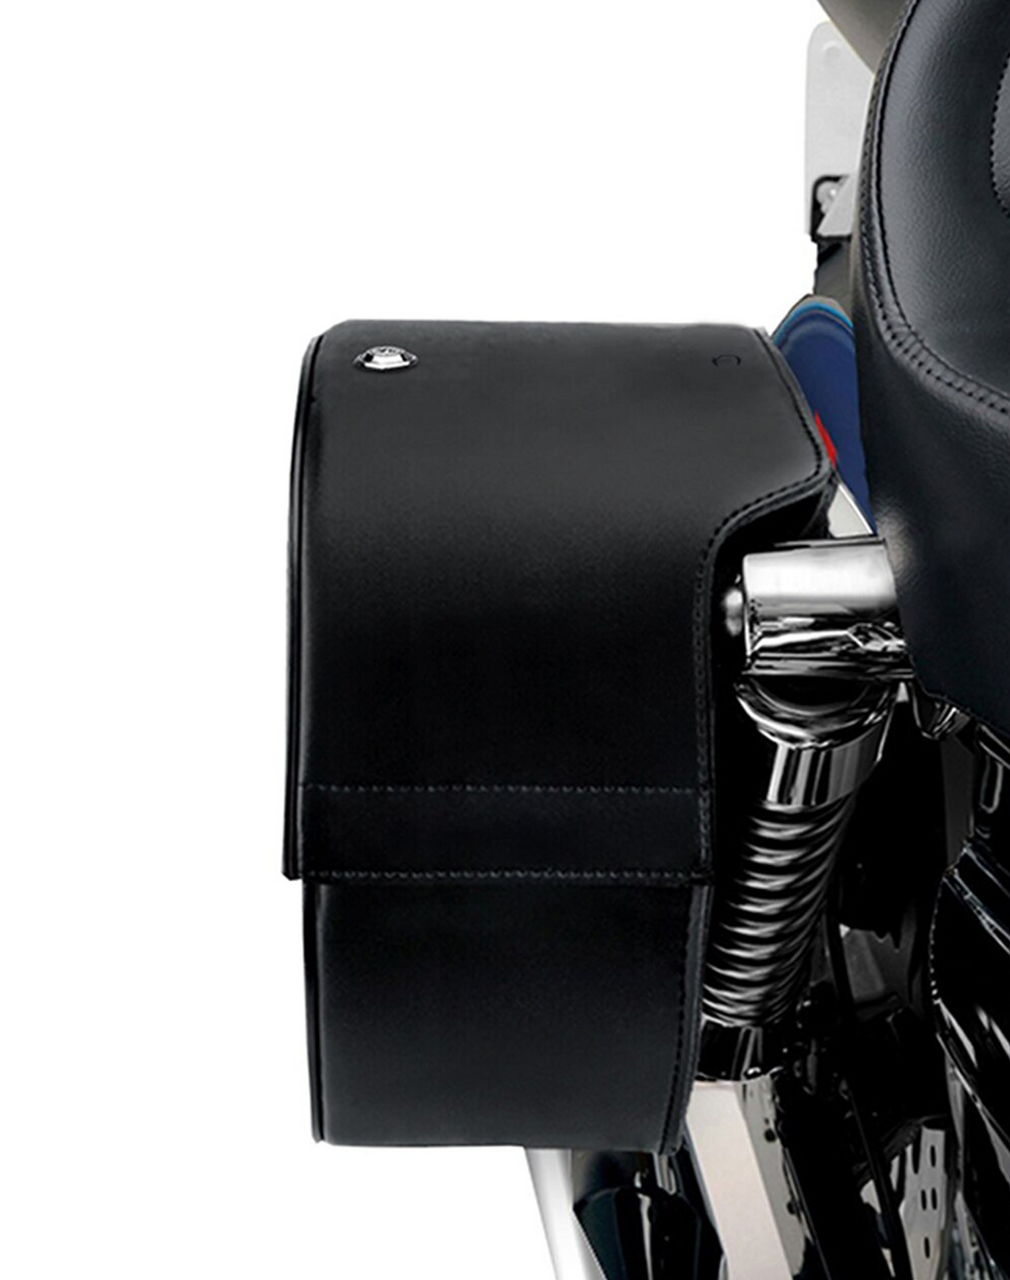 Honda Rebel 500 Single Strap Shock Cutout Slanted Large Motorcycle Saddlebags Shock Cutout View